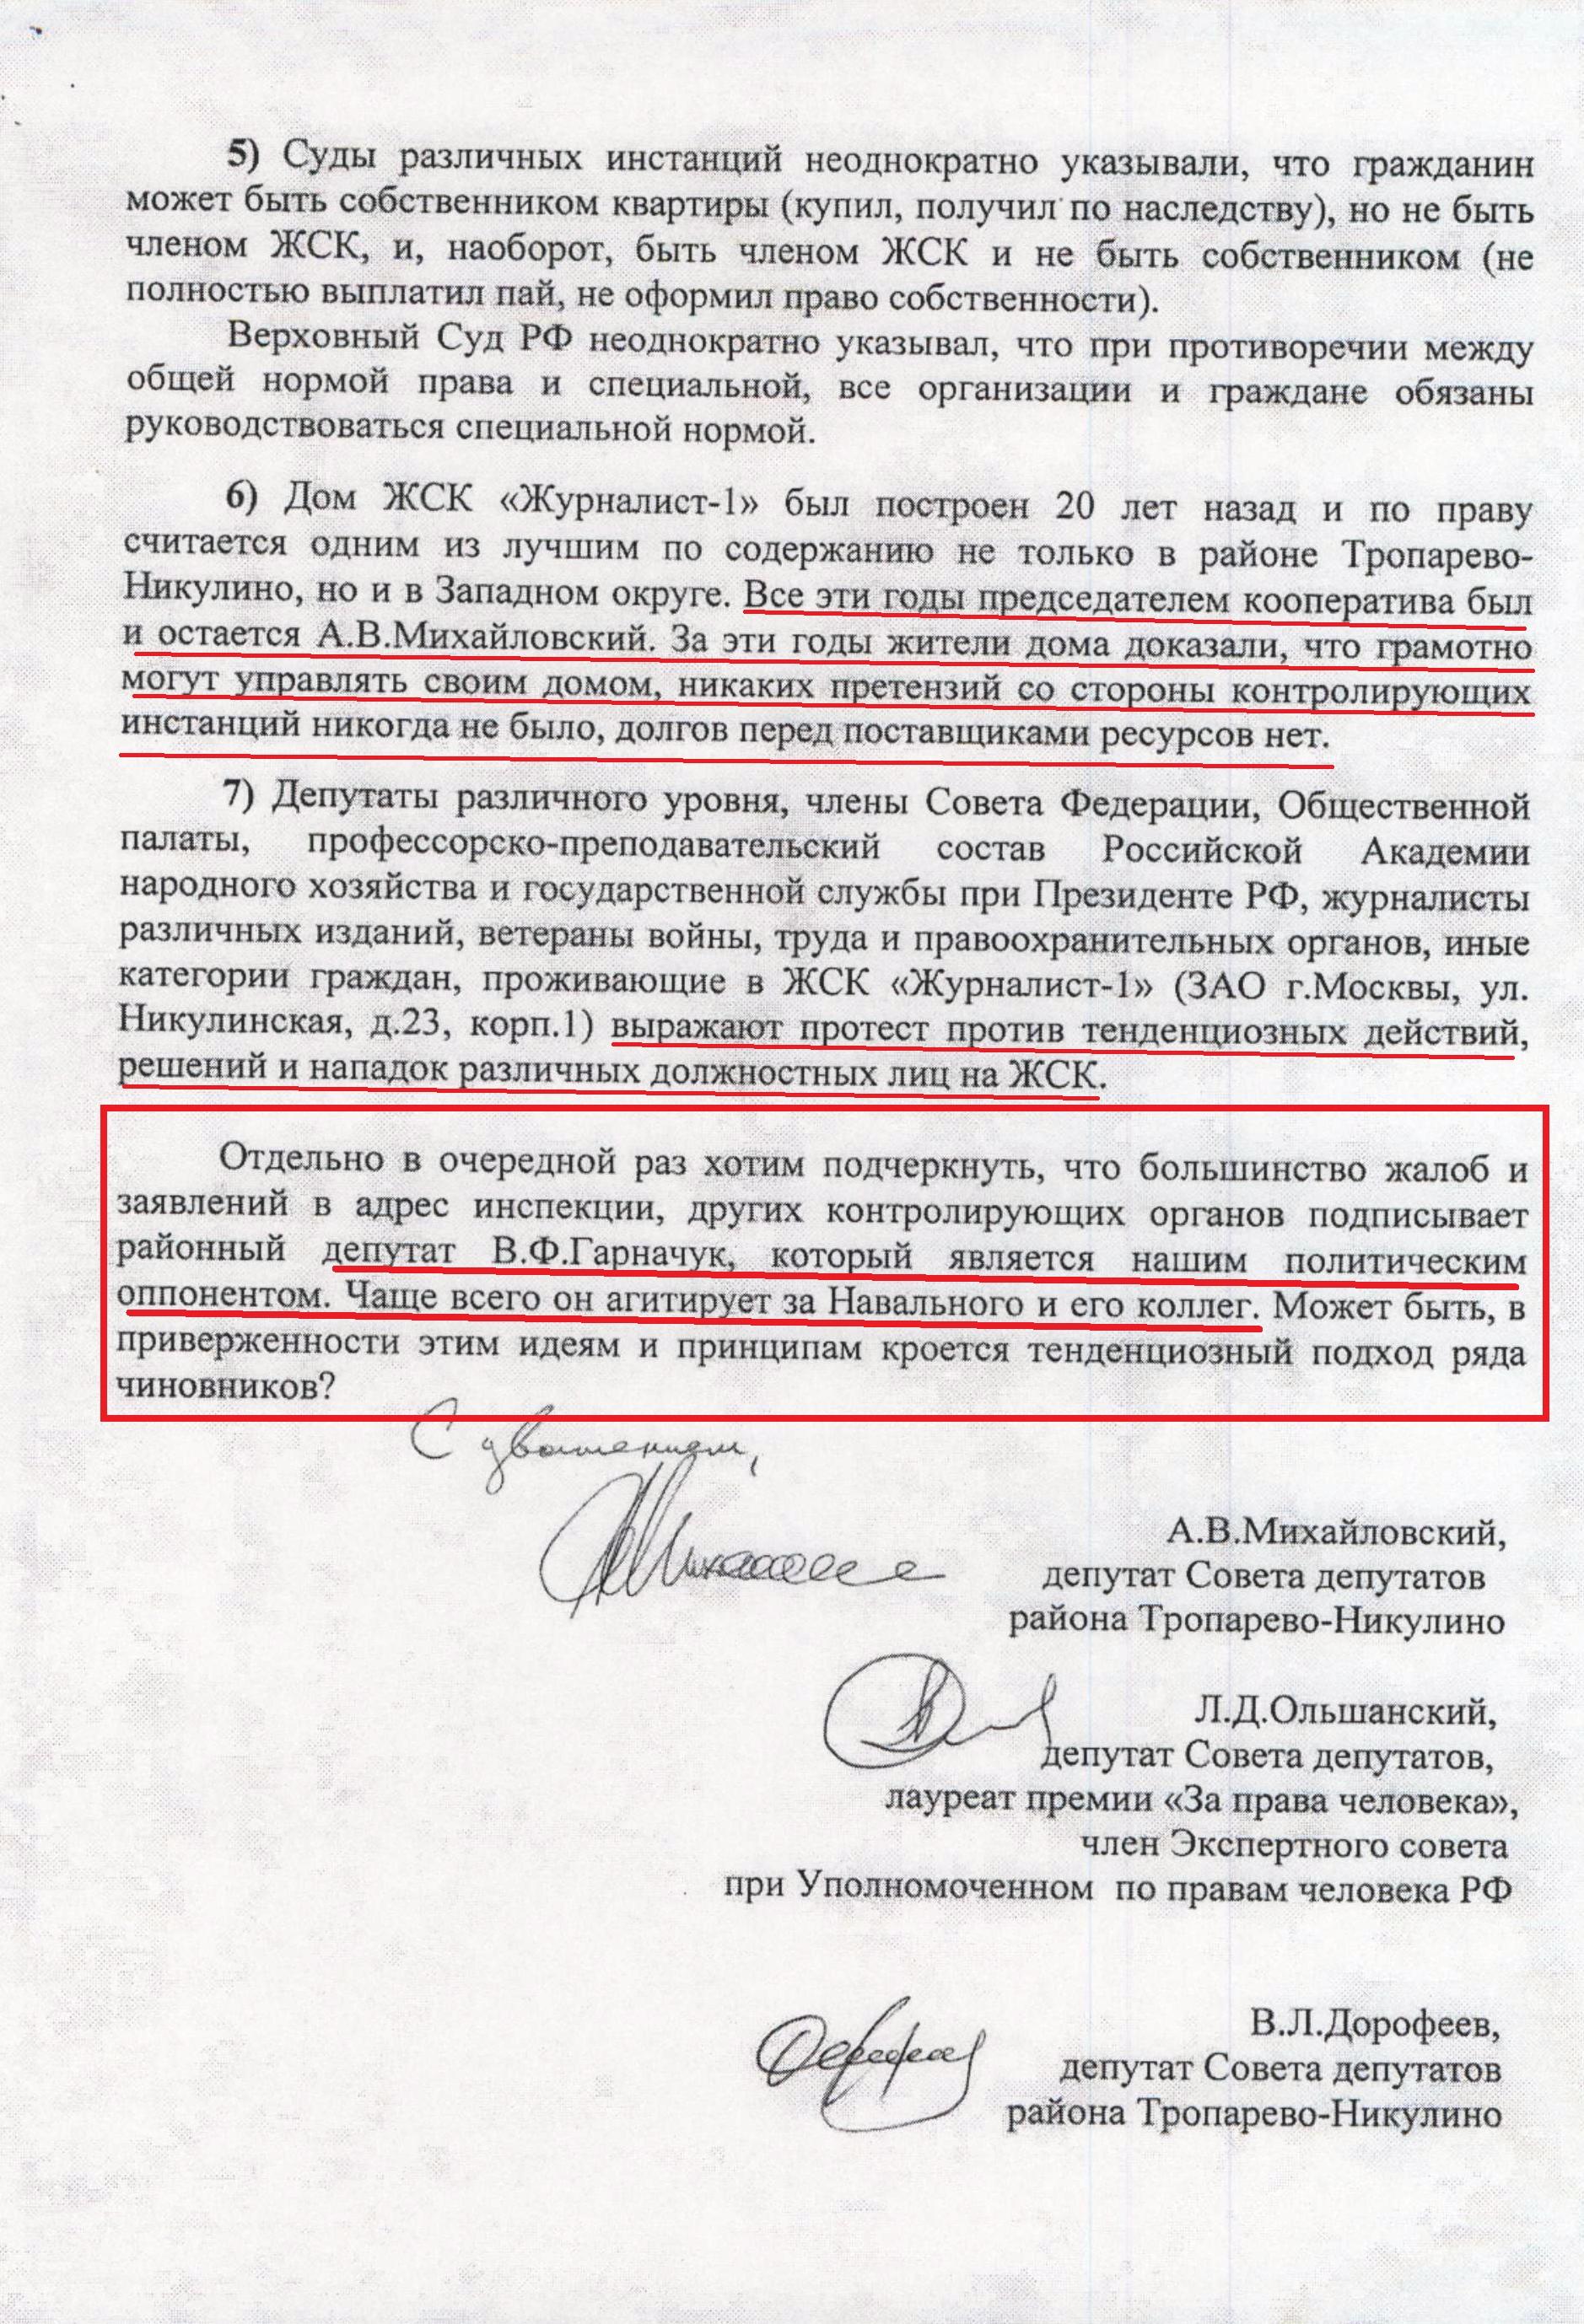 донос  Михайловский 12.11.13 003